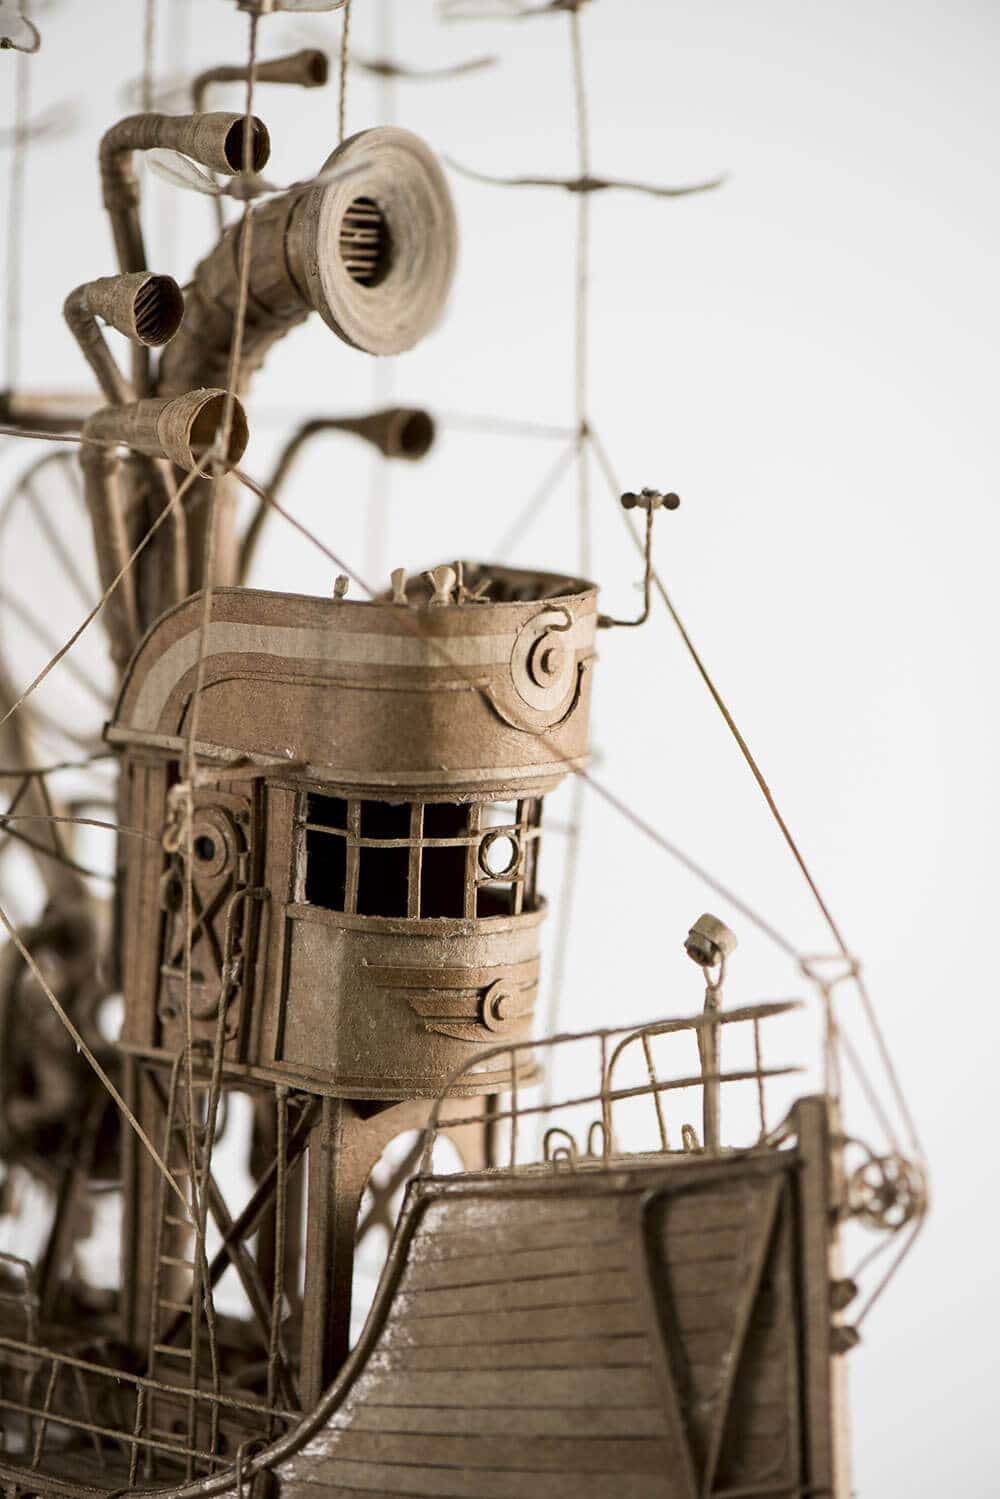 sculptural airships cardboard 3